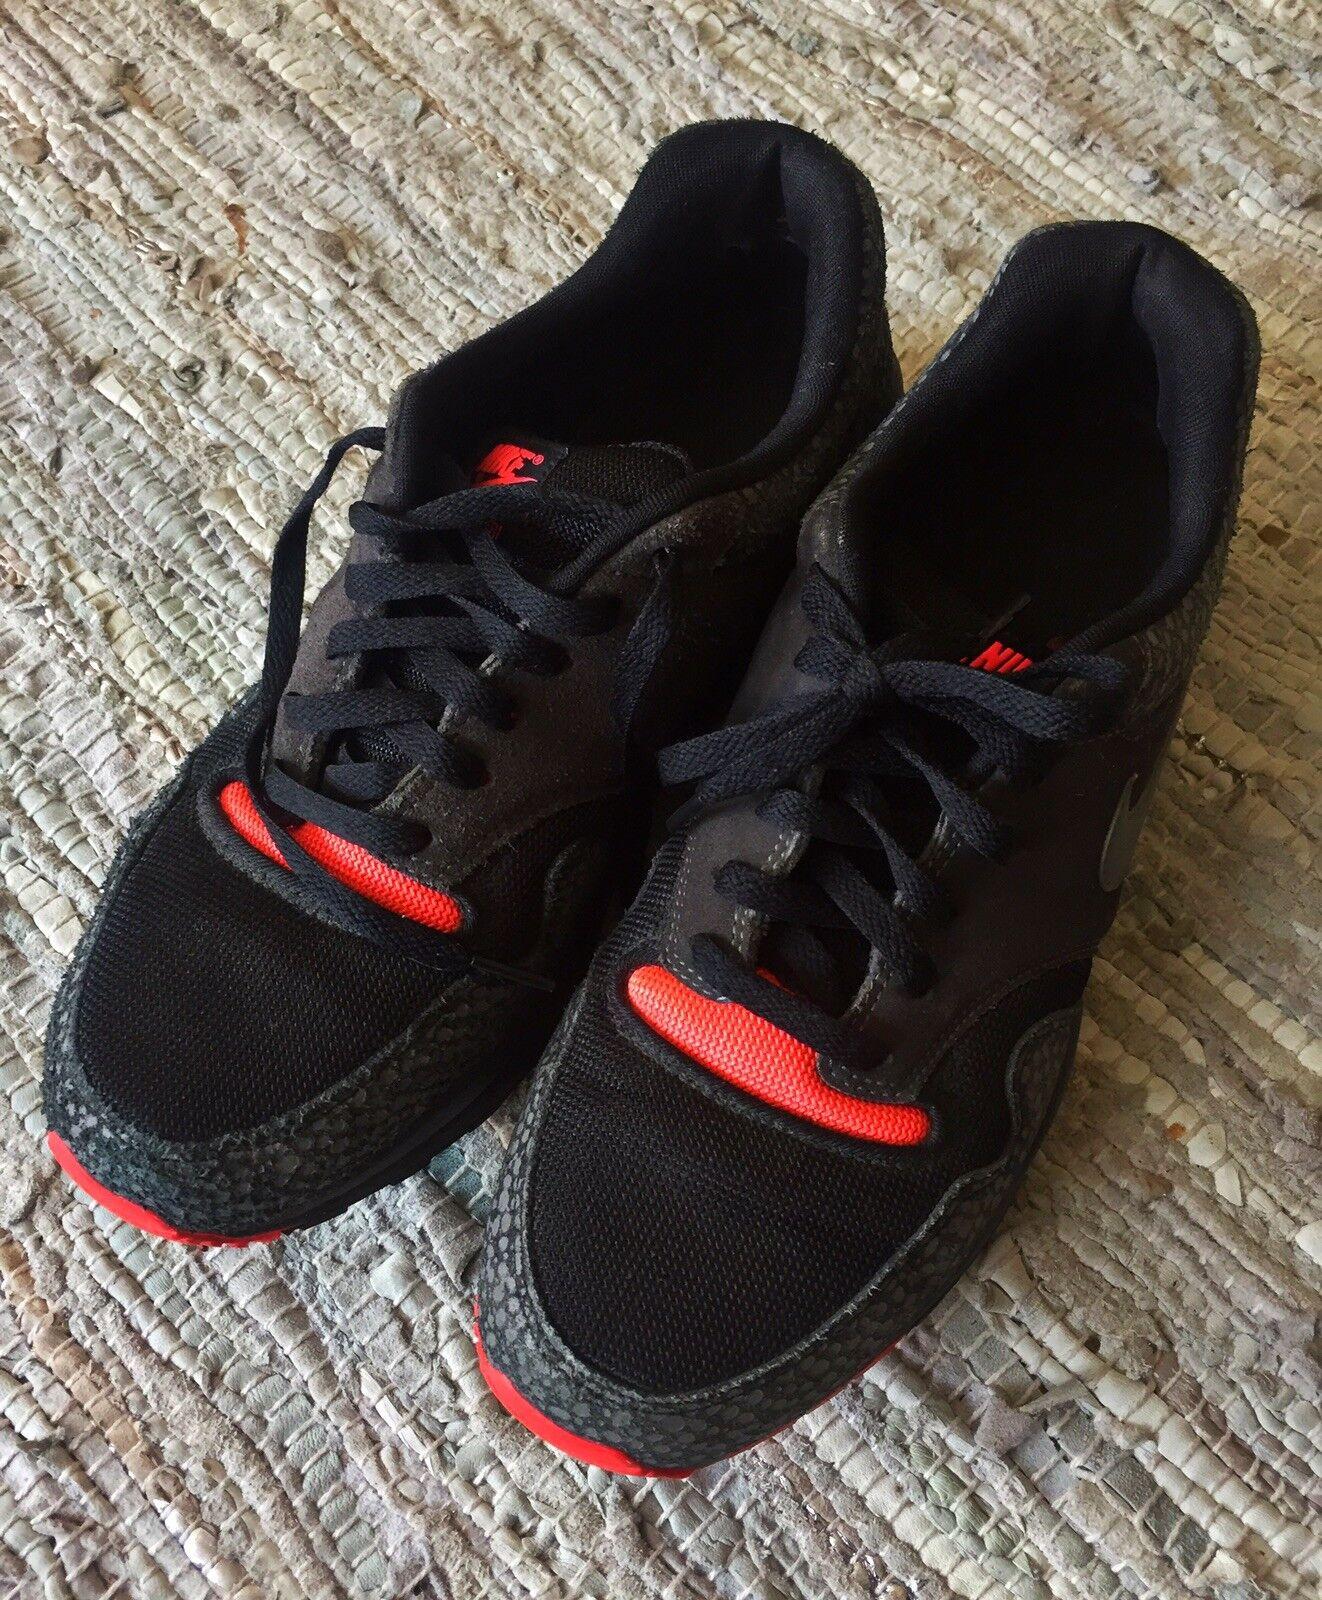 Nike Air Safari,Sneaker, 45, Schwarz, Neon-Pink, graue Punkte, 45, Safari,Sneaker, Vintage, Rarität c85b9e